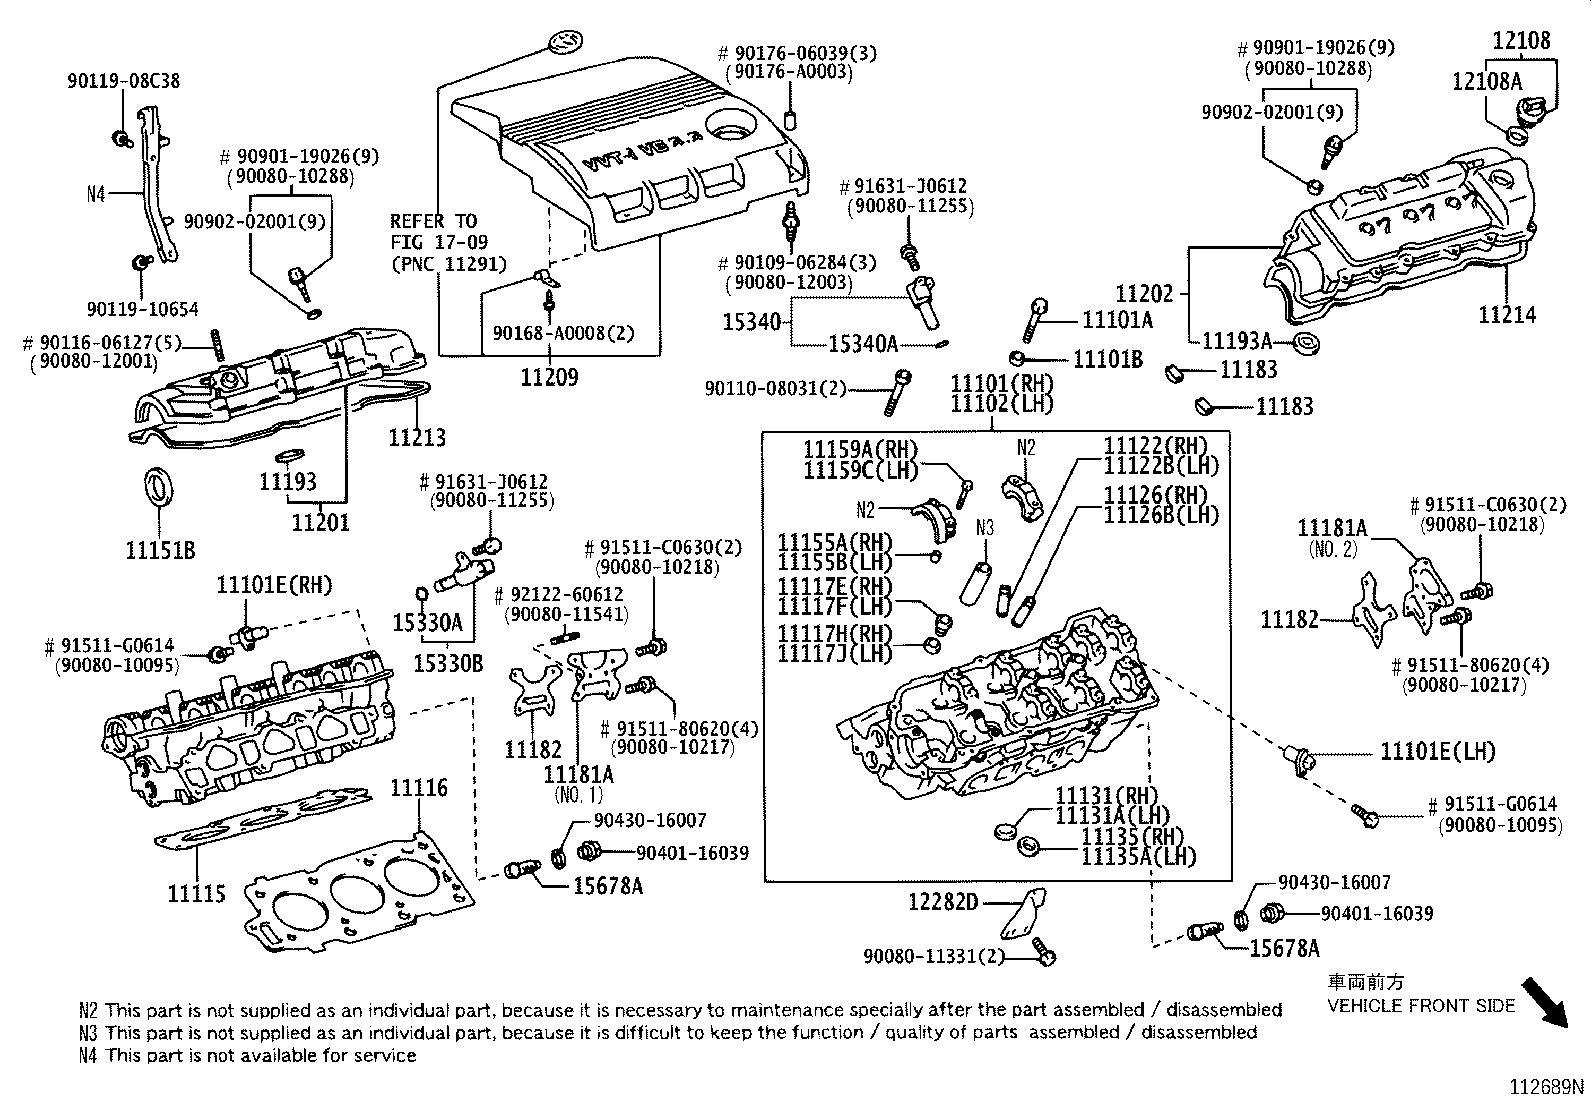 Toyota Sienna Engine Valve Cover Gasket Gasket